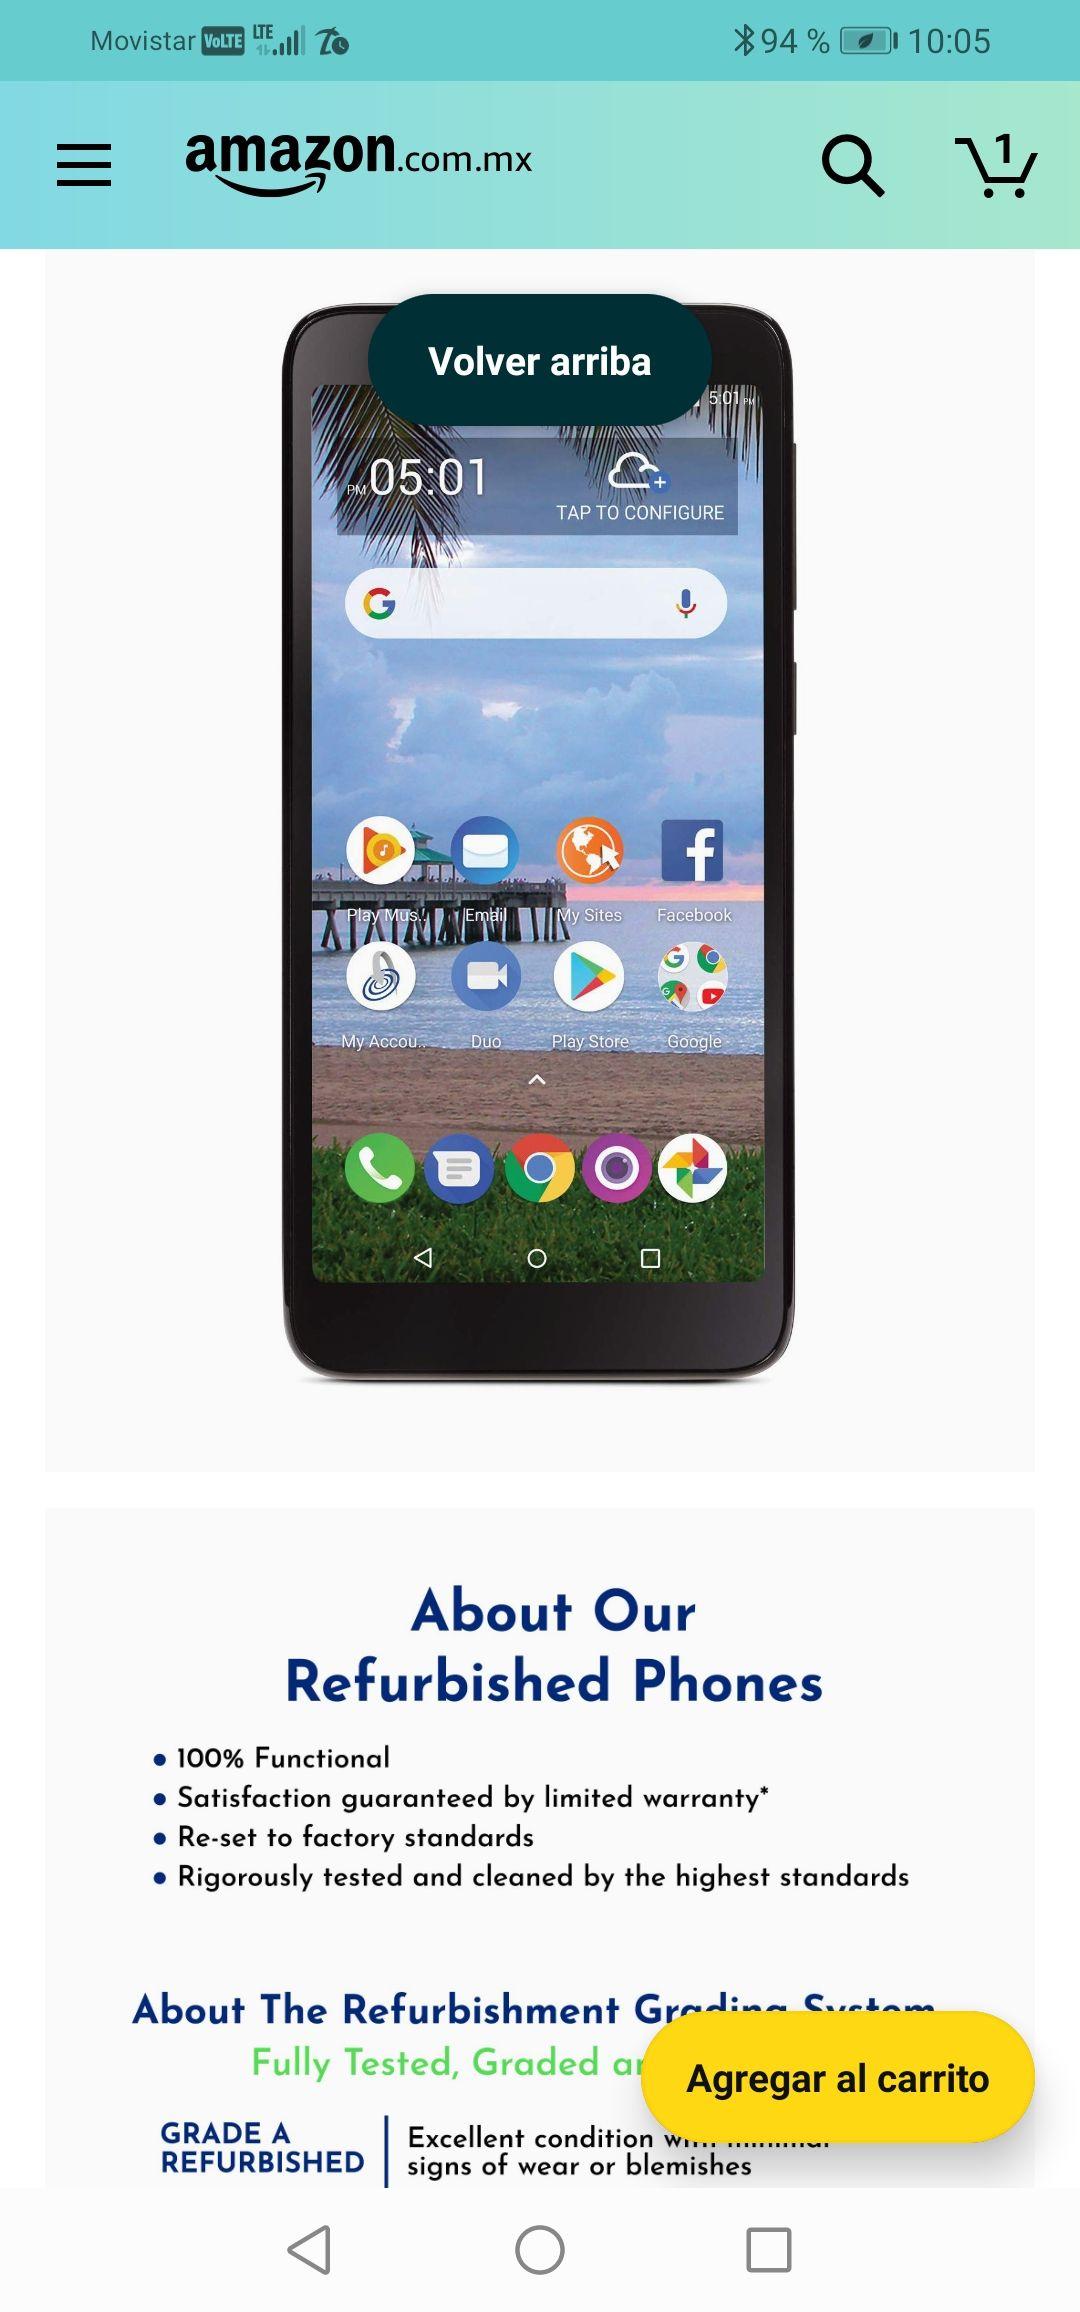 Amazon : Tracfone TCL A1 4G LTE Prepago Smartphone - Negro - 16GB - Tarjeta SIM incluida - CDMA (renovado)